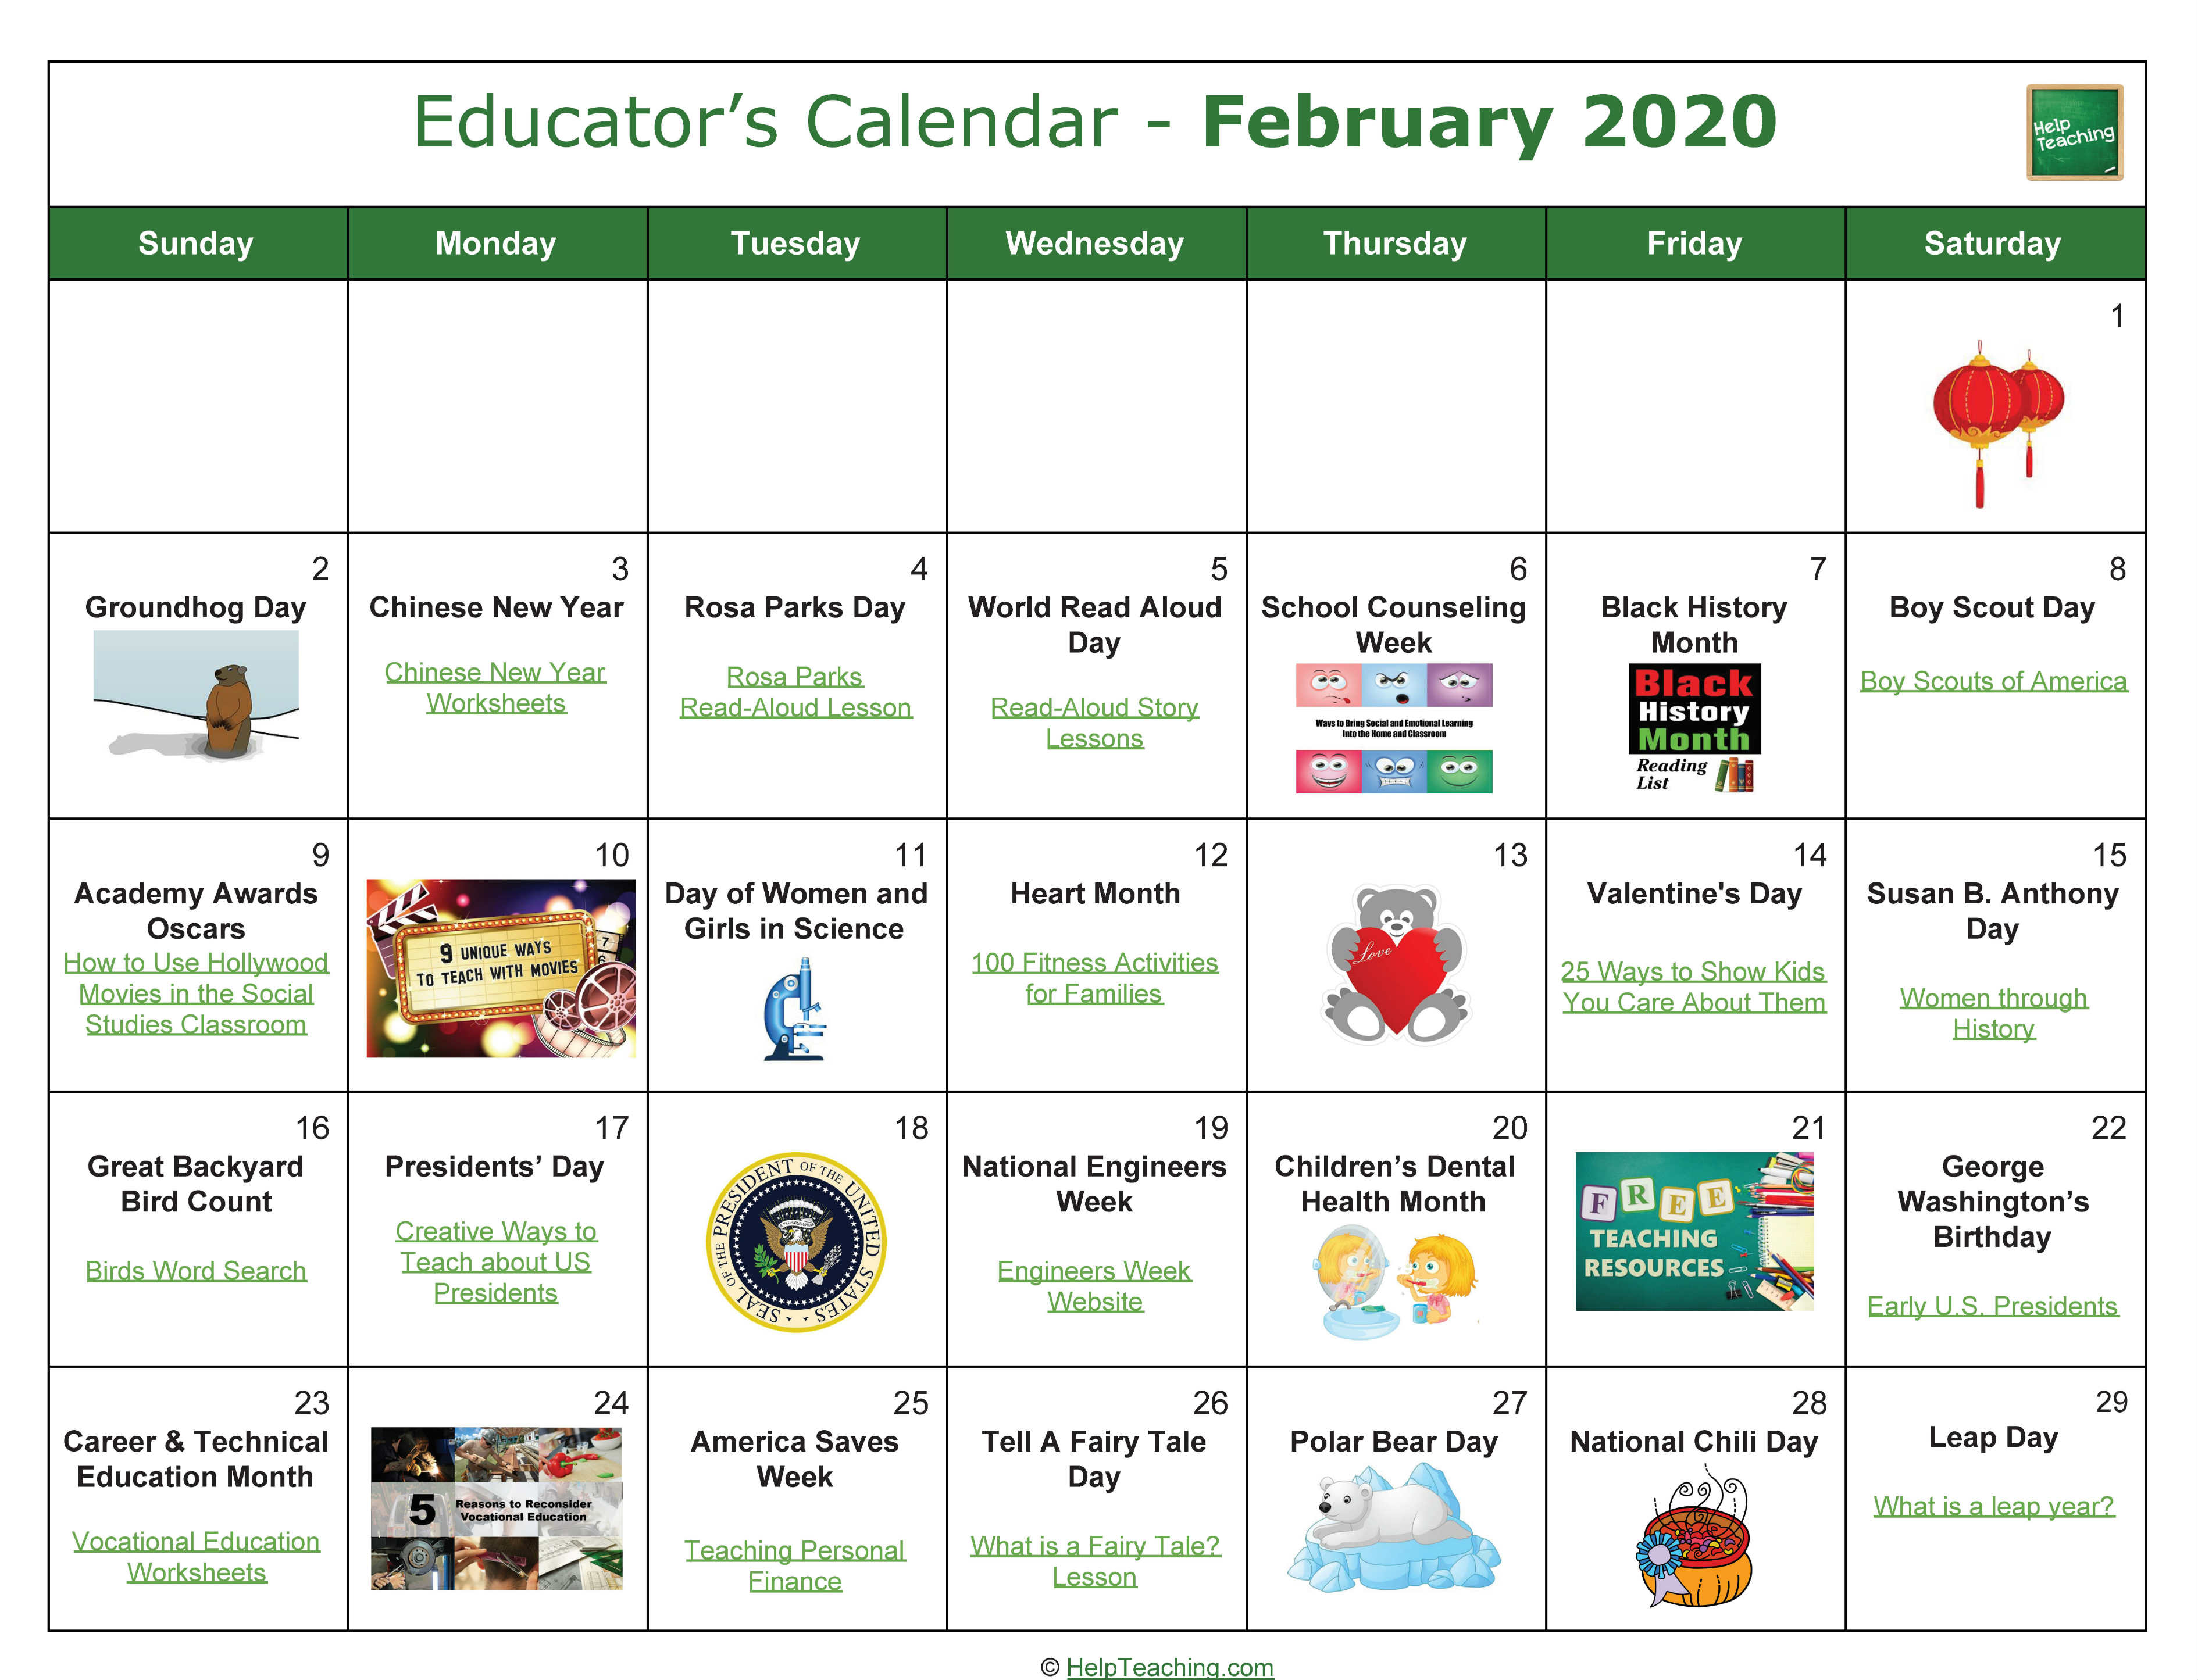 February Educator's Calendar